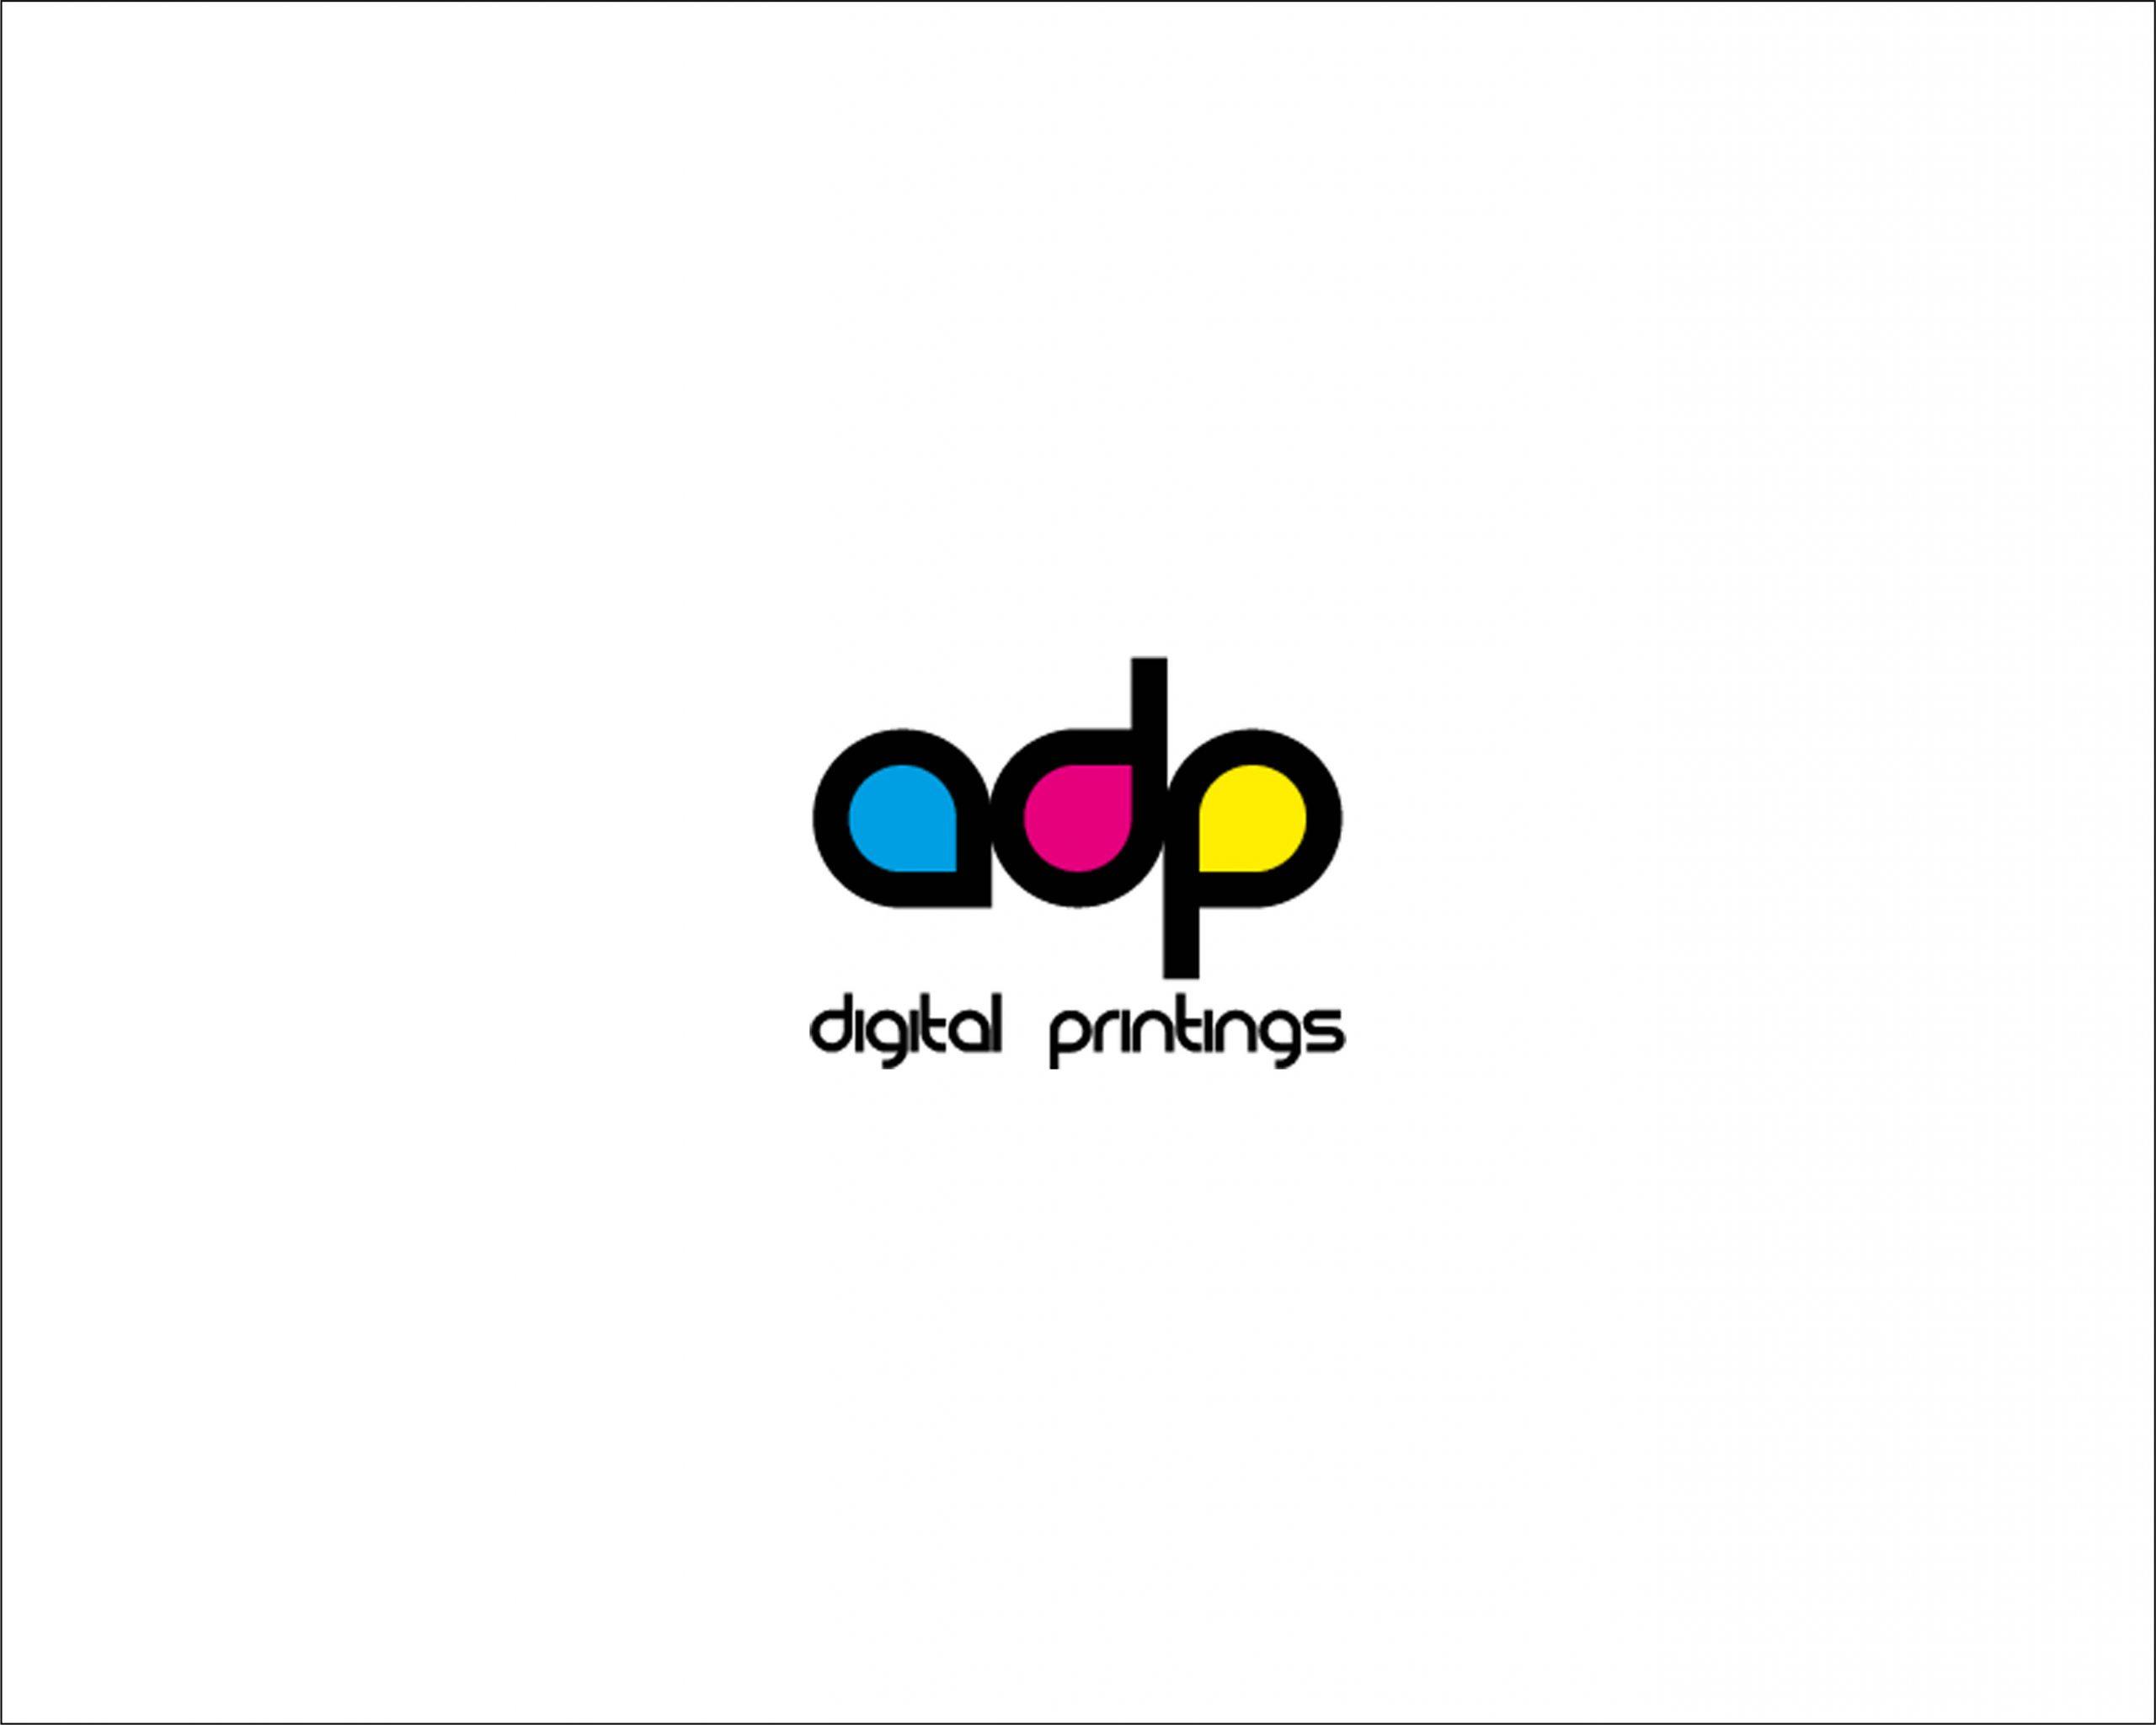 ADP – Digital Printings